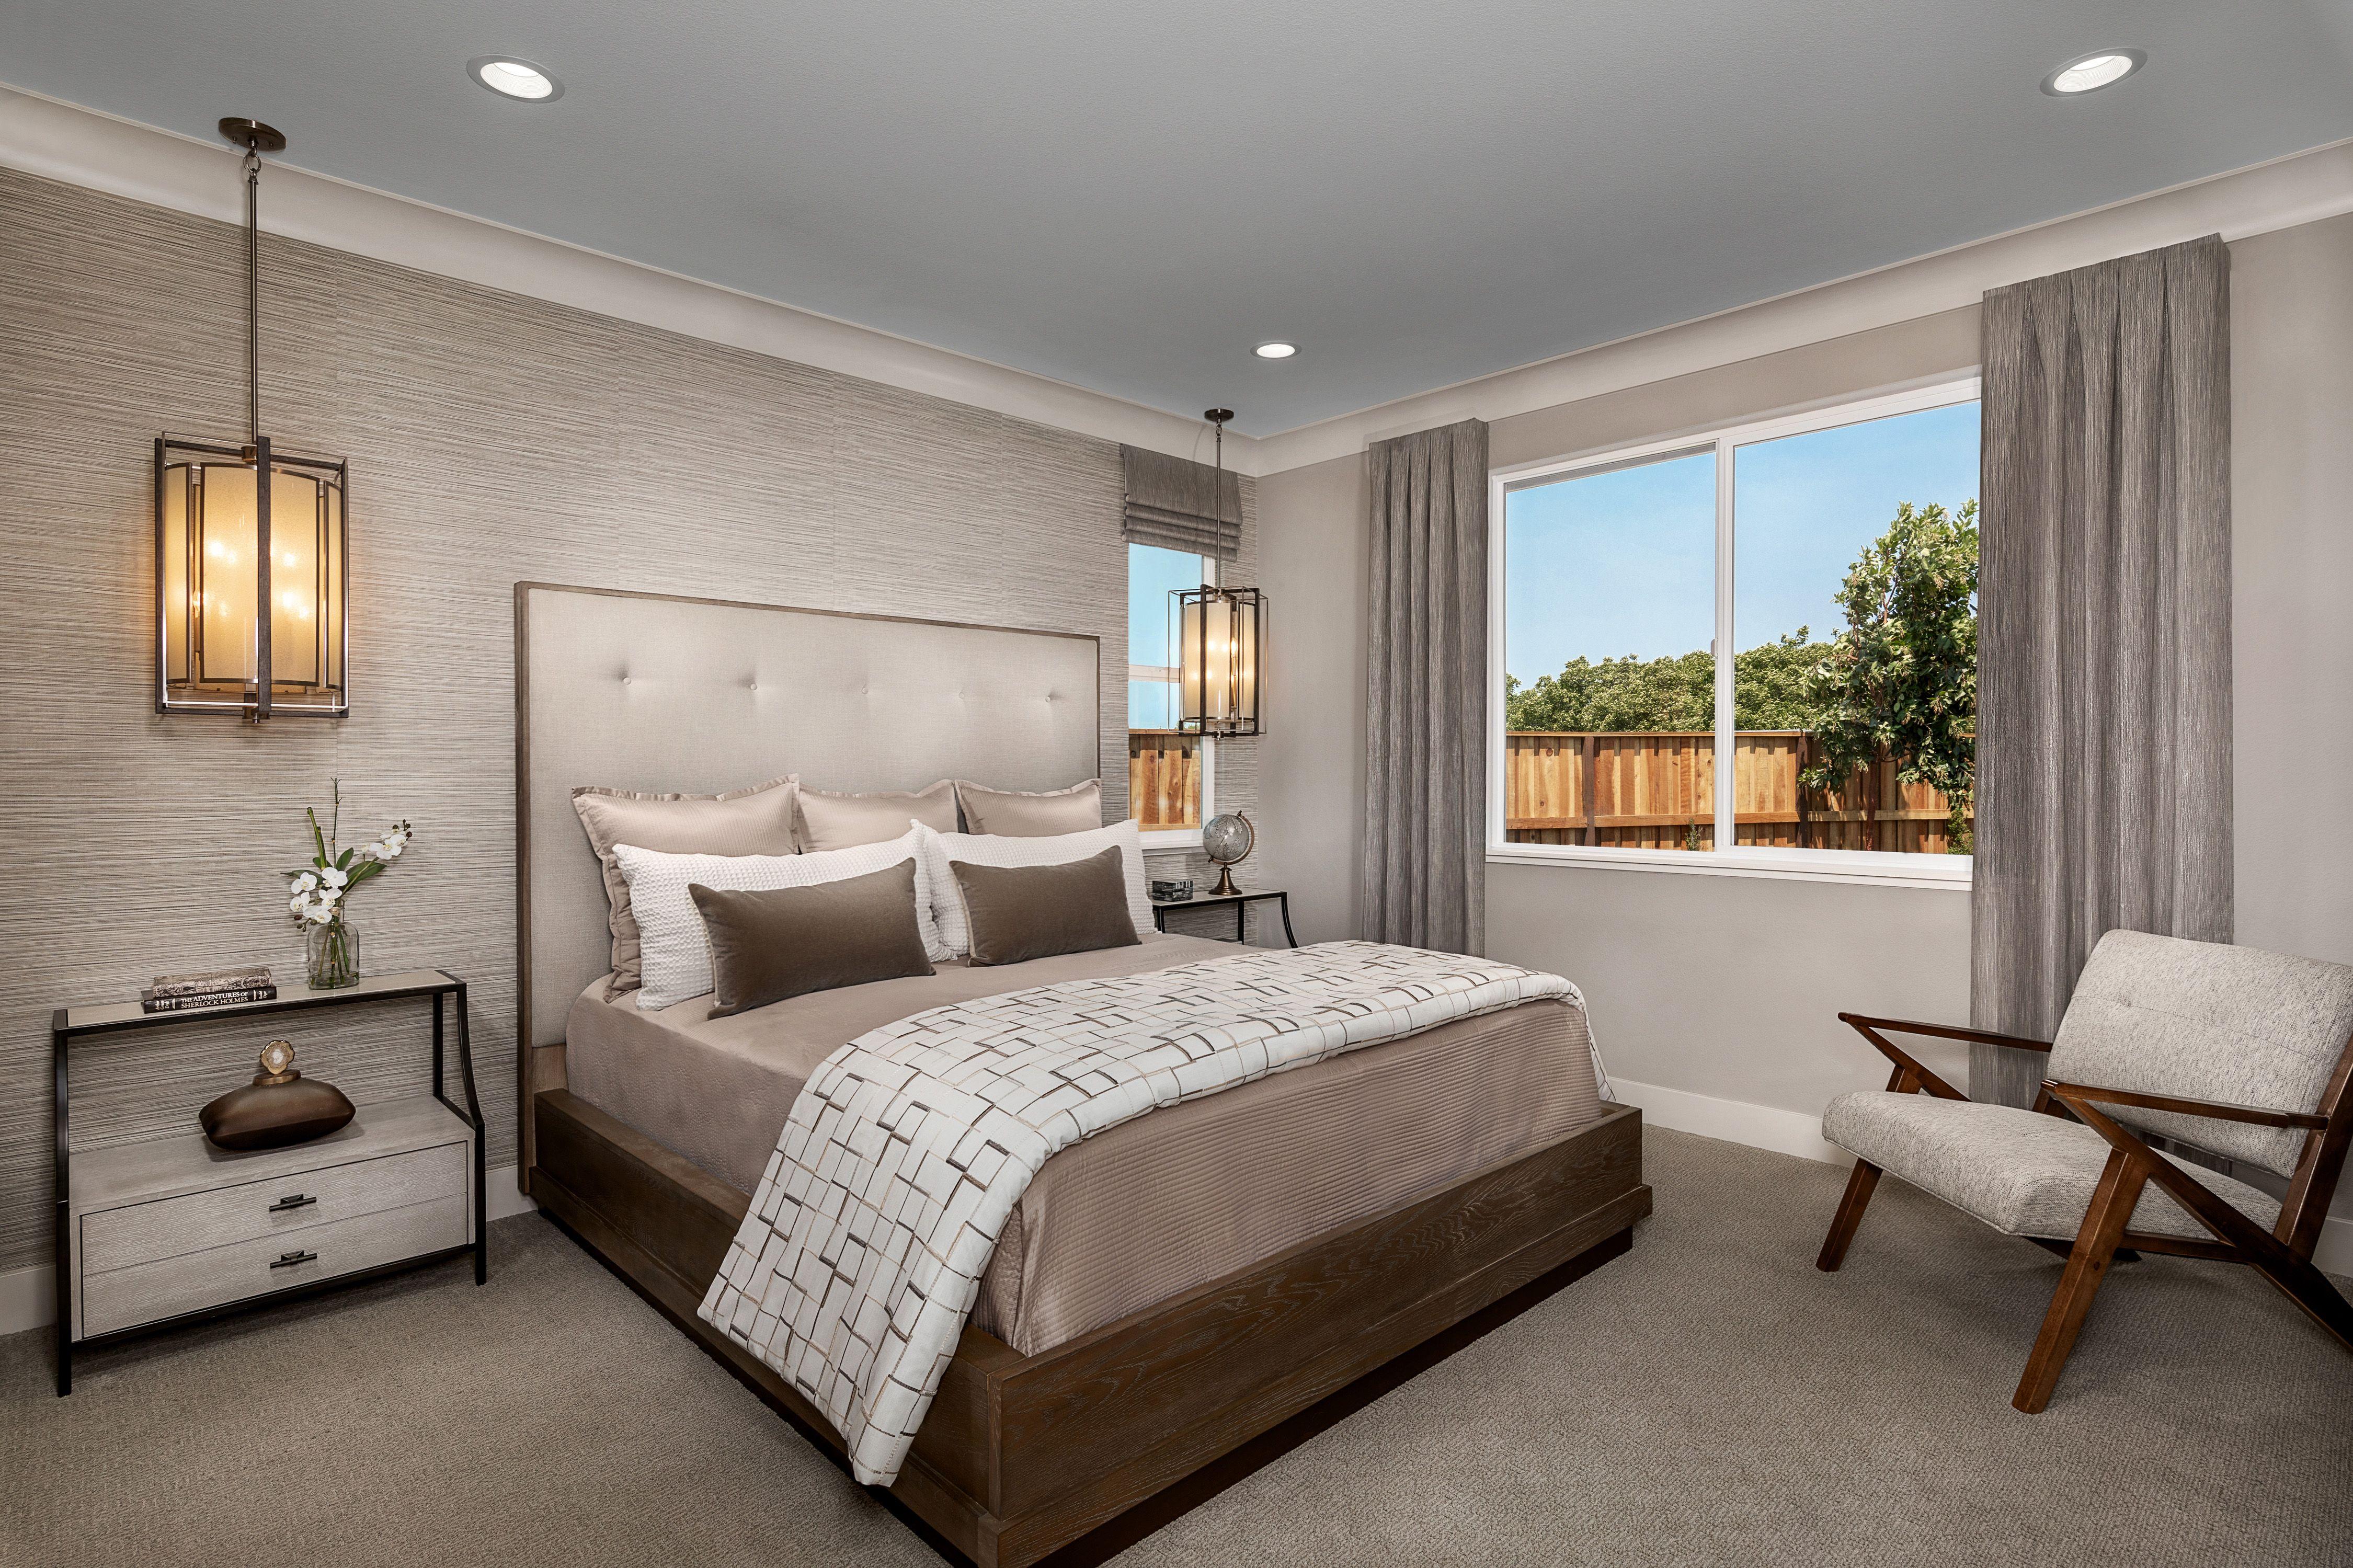 Bedroom featured in the Mayfair Residence 1 By Kiper Homes in Santa Cruz, CA